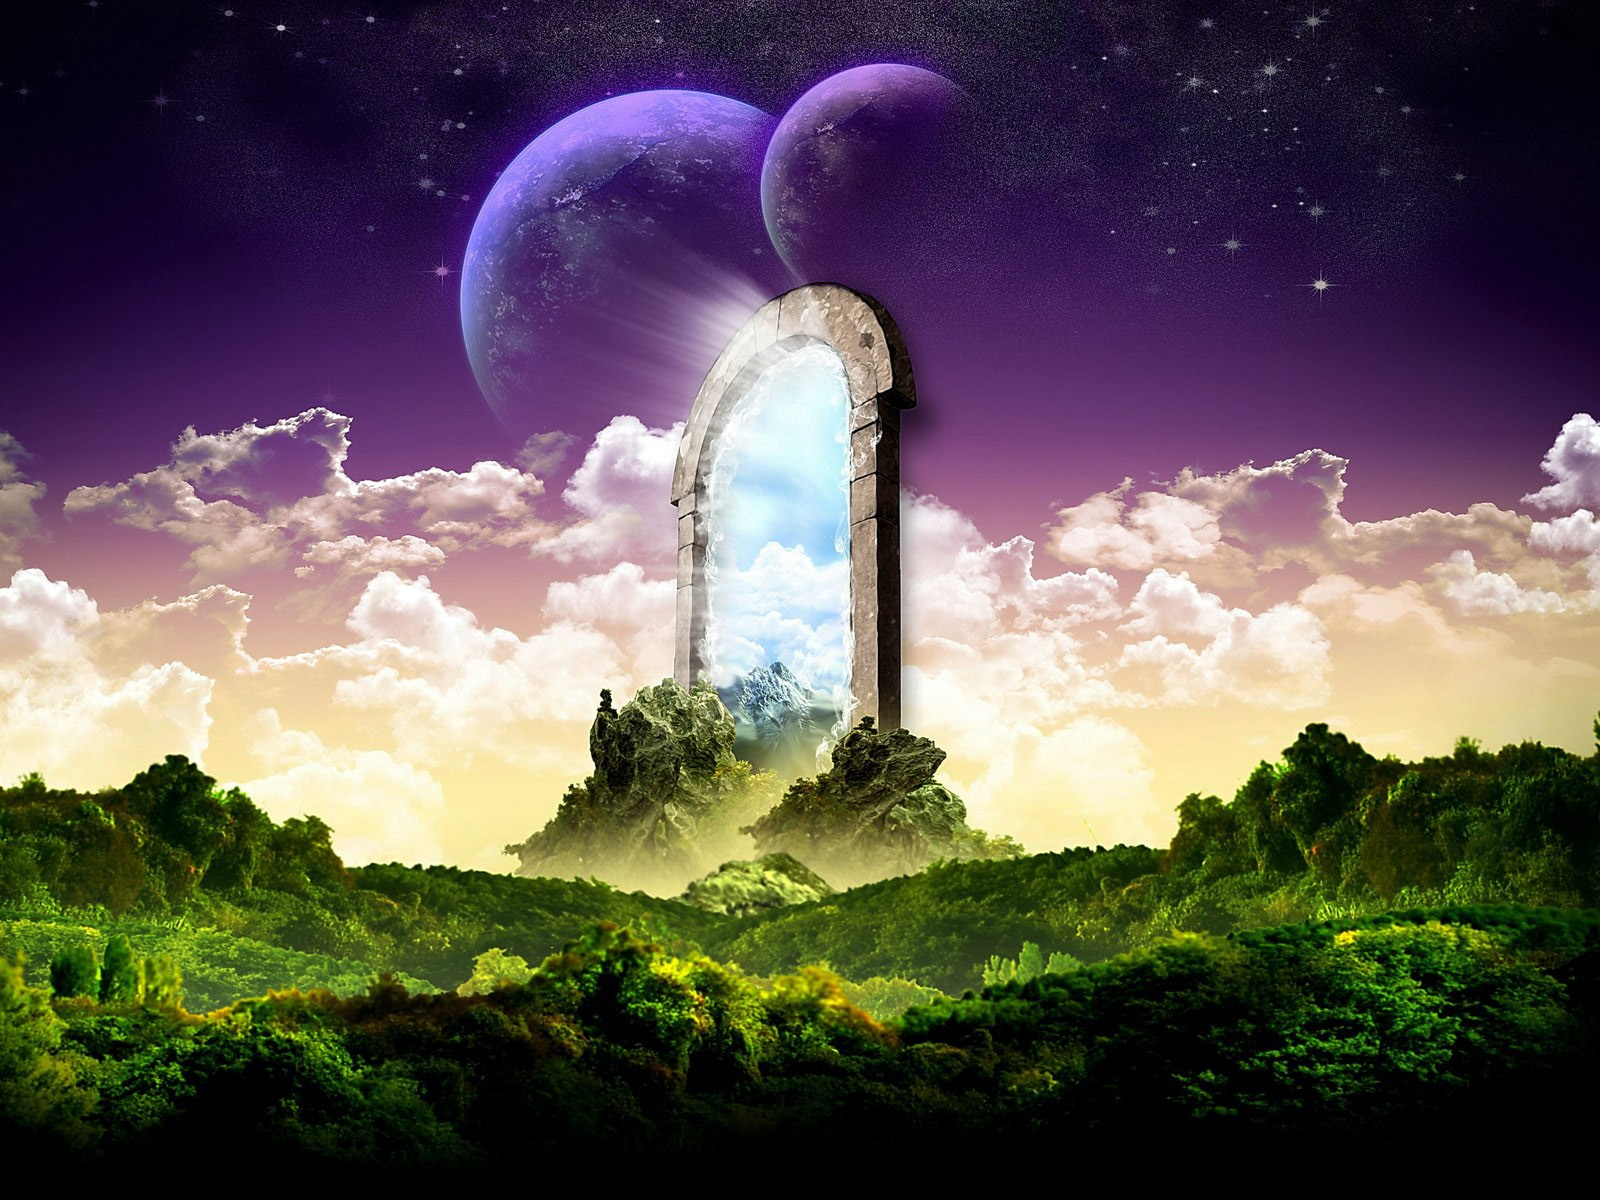 http://3.bp.blogspot.com/-nKz7szKiMxo/UEvTWtXrtXI/AAAAAAAAADY/NXGOzspWTUA/s1600/fantasy-dream-wallpaper-10.jpg